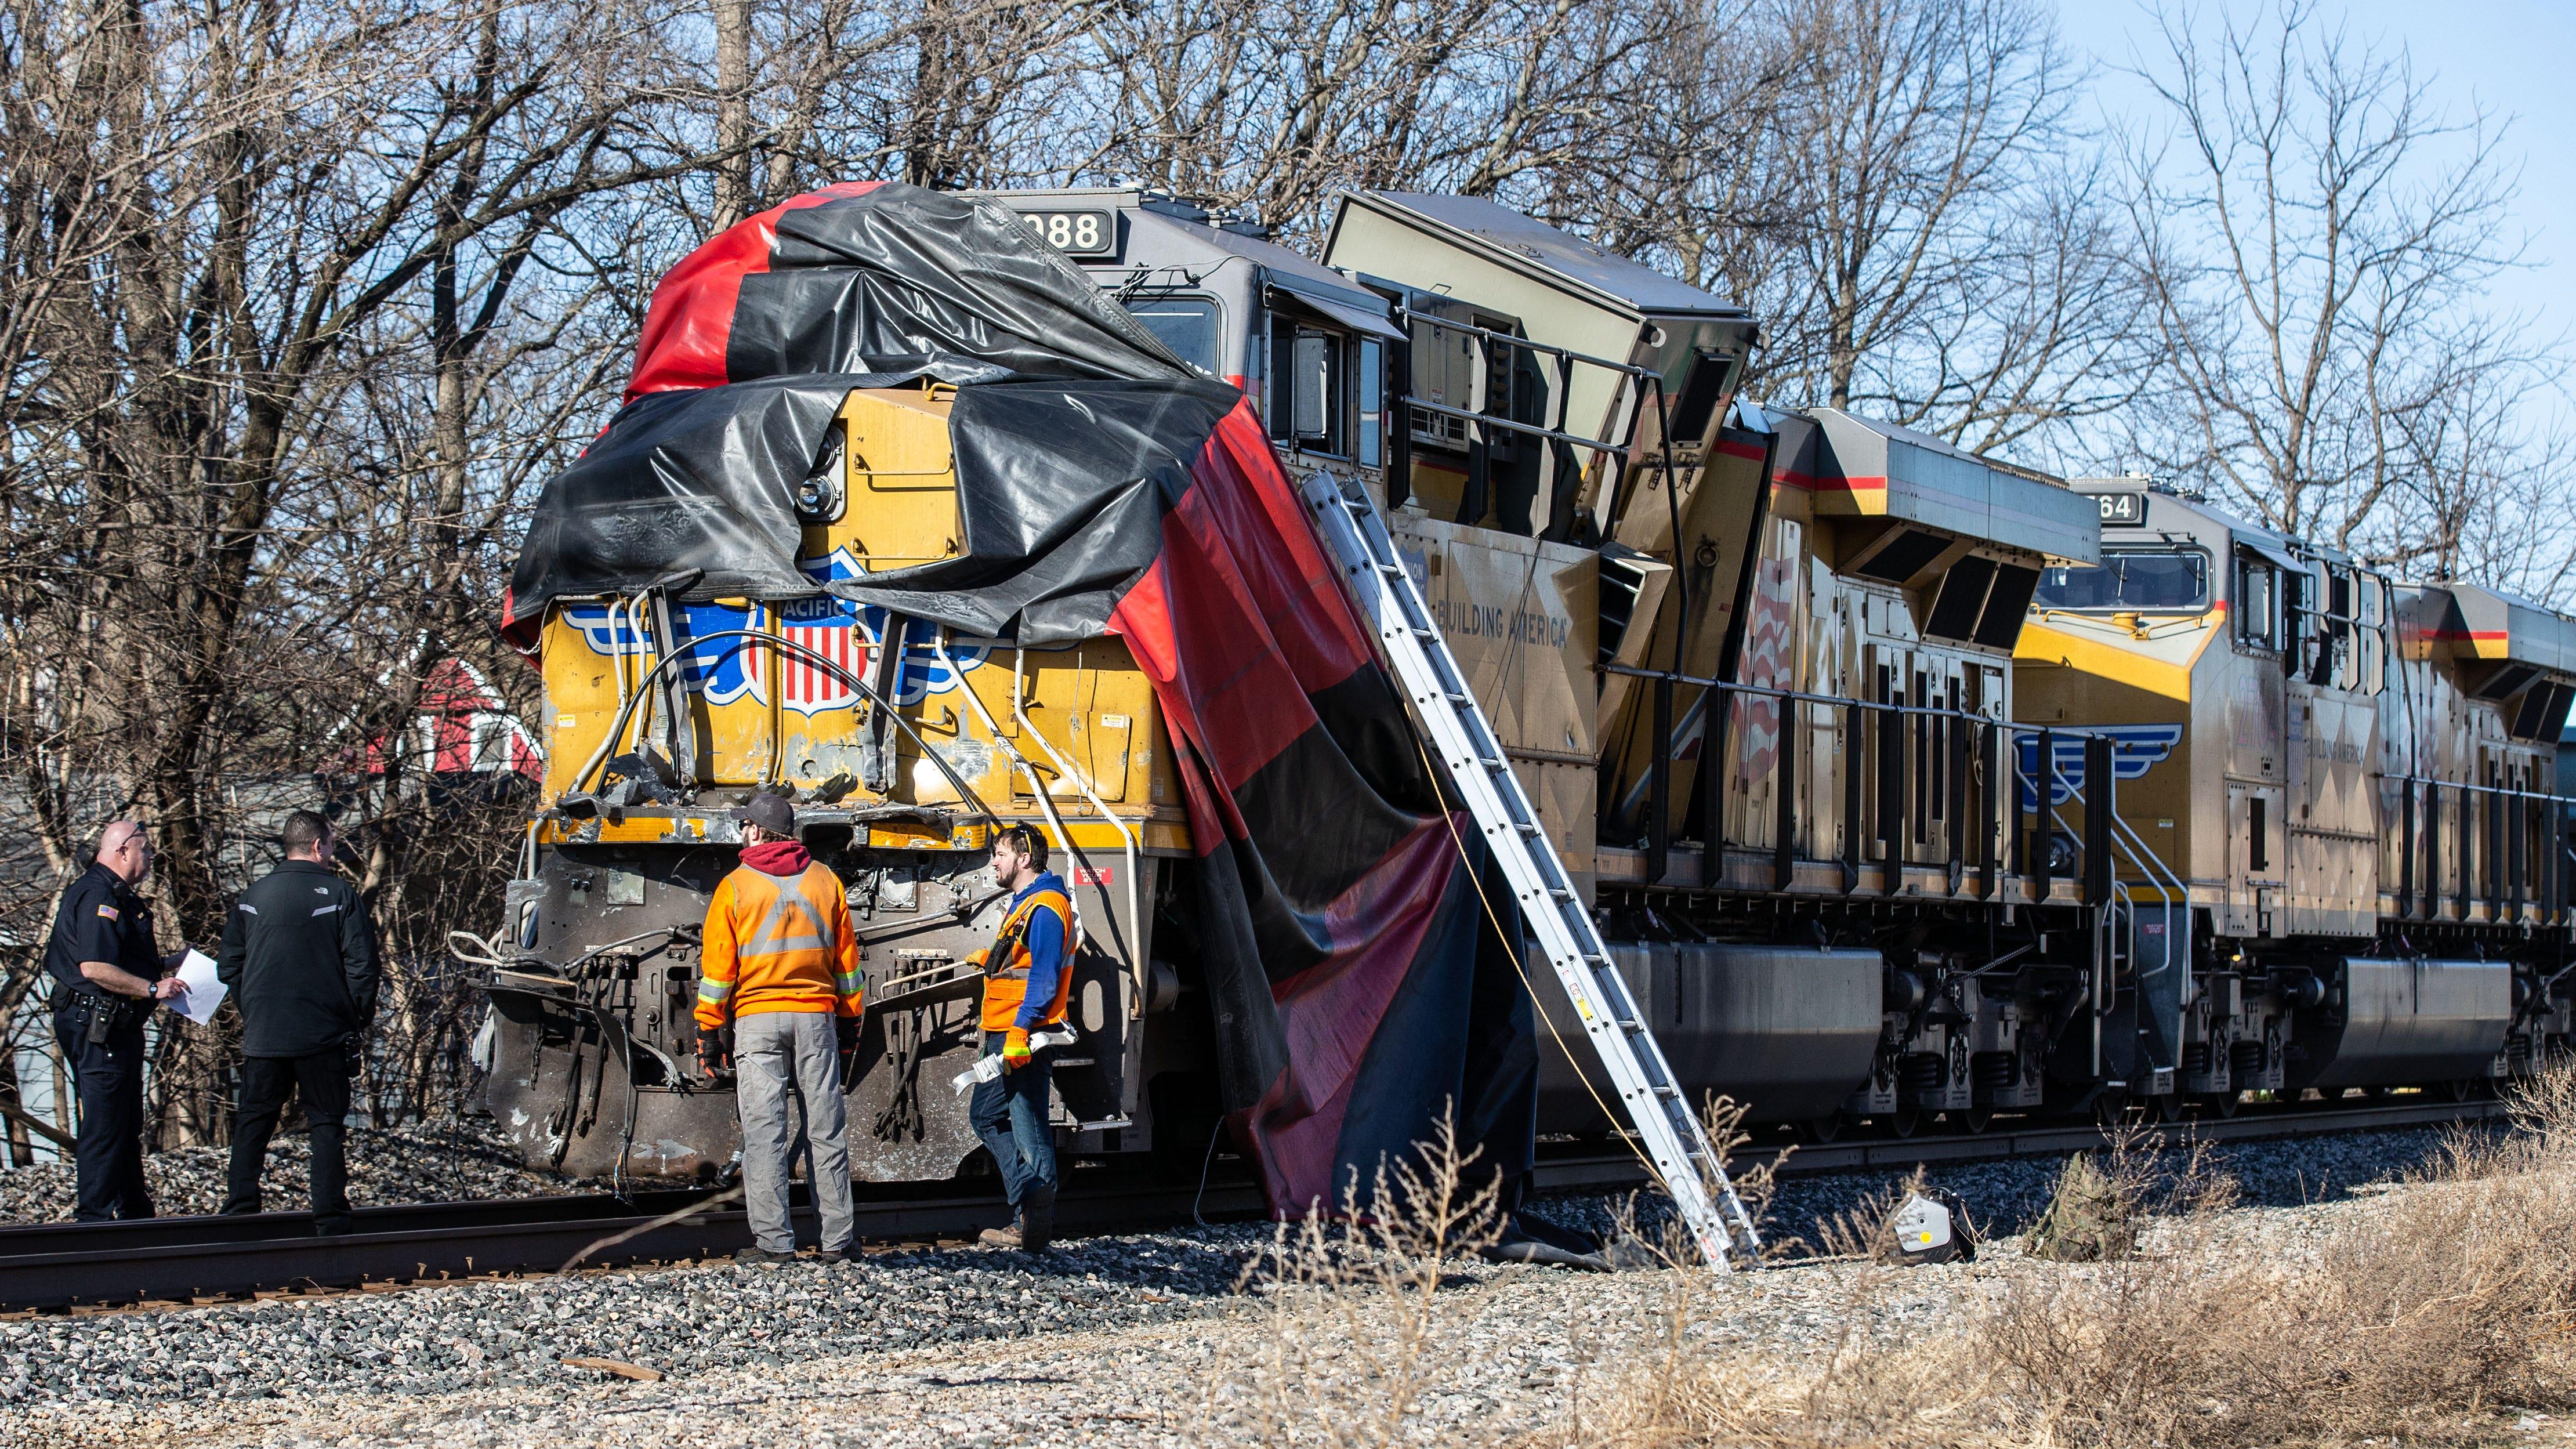 Freight train collides with semi-trailer truck in Oconomowoc